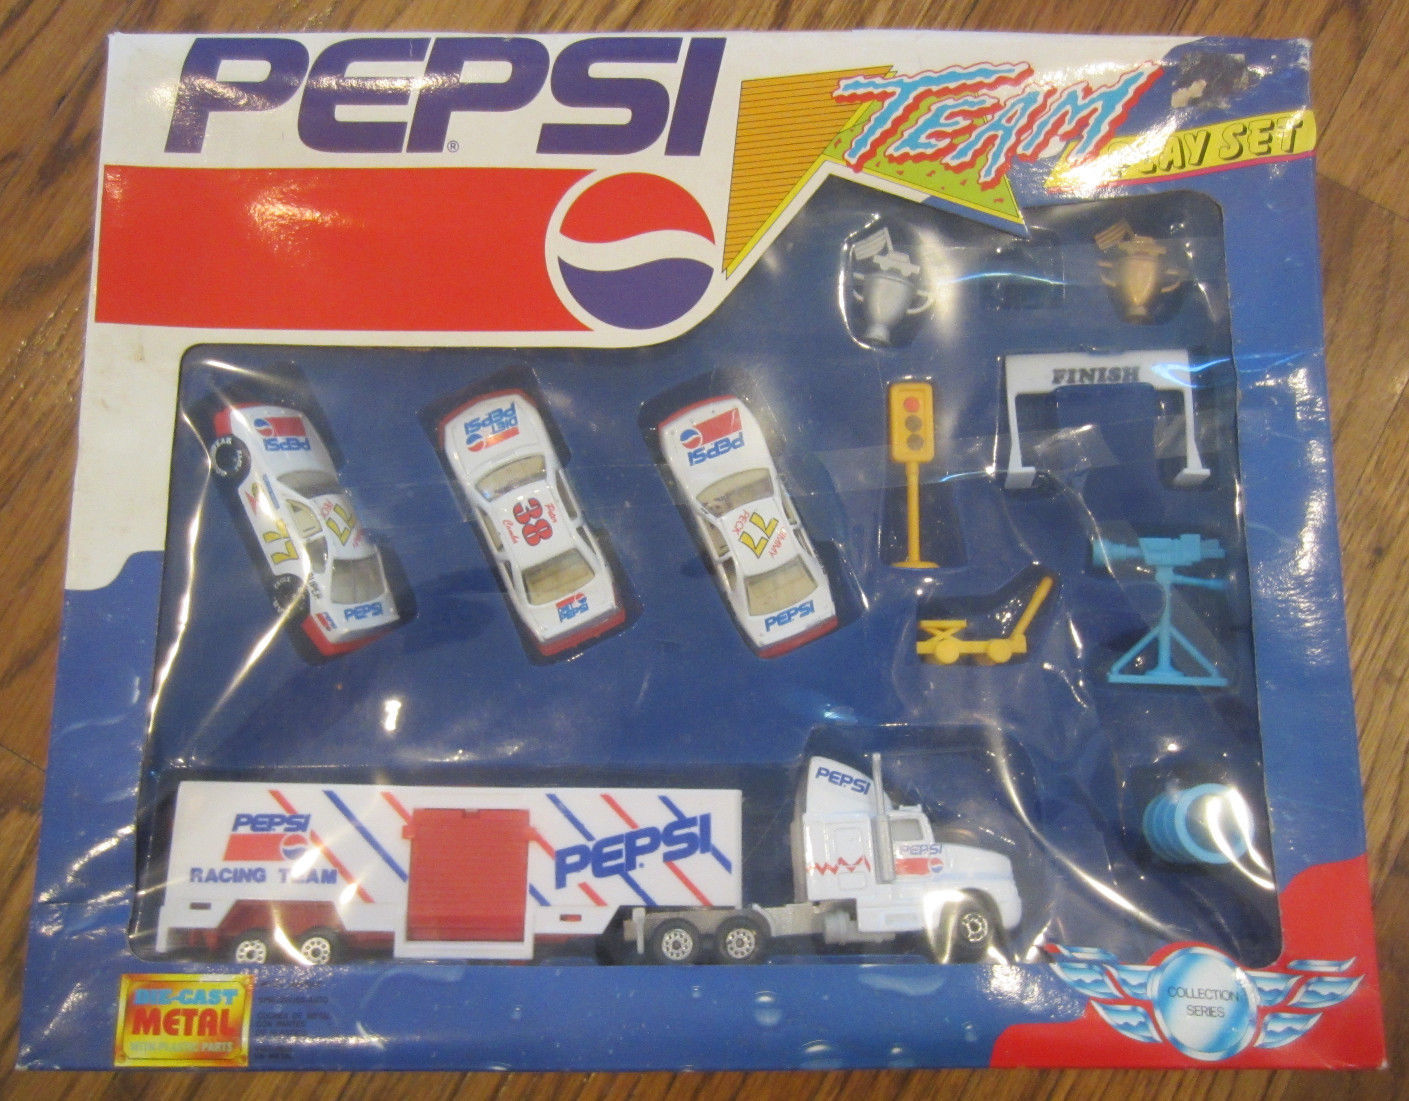 Vintage Pepsi-Cola Play Set Die-Cast Metal Cola Semi Truck Car Accessory box set